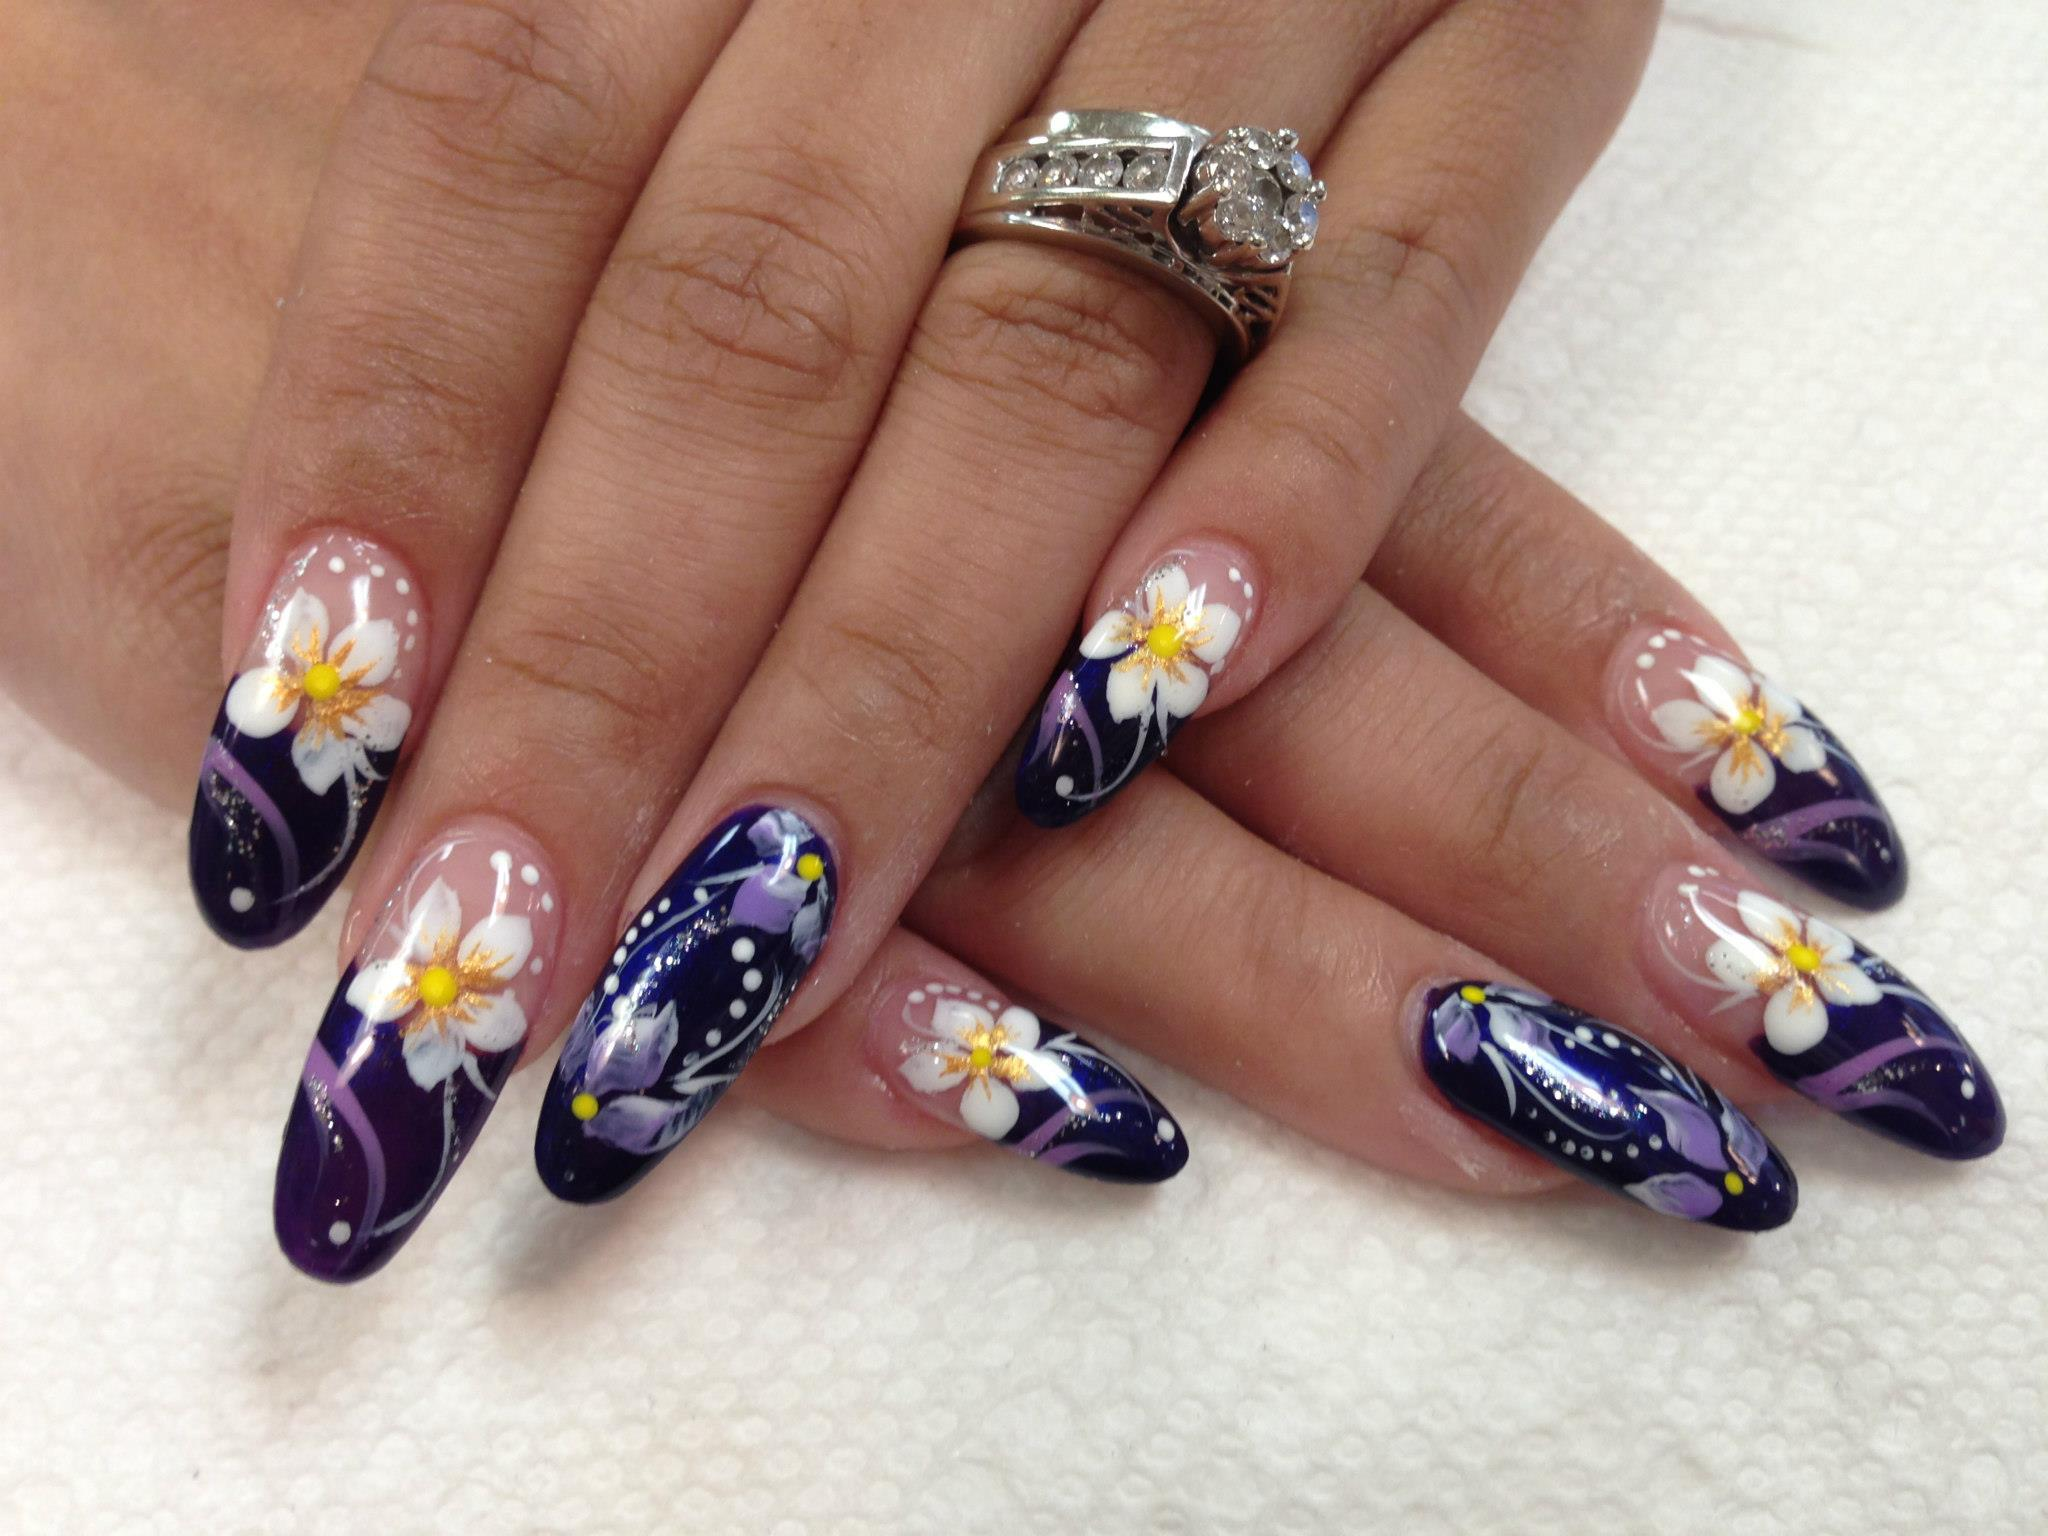 nail nails designs royal faberge clarksville tn salon spa exquisite tip purple topnails